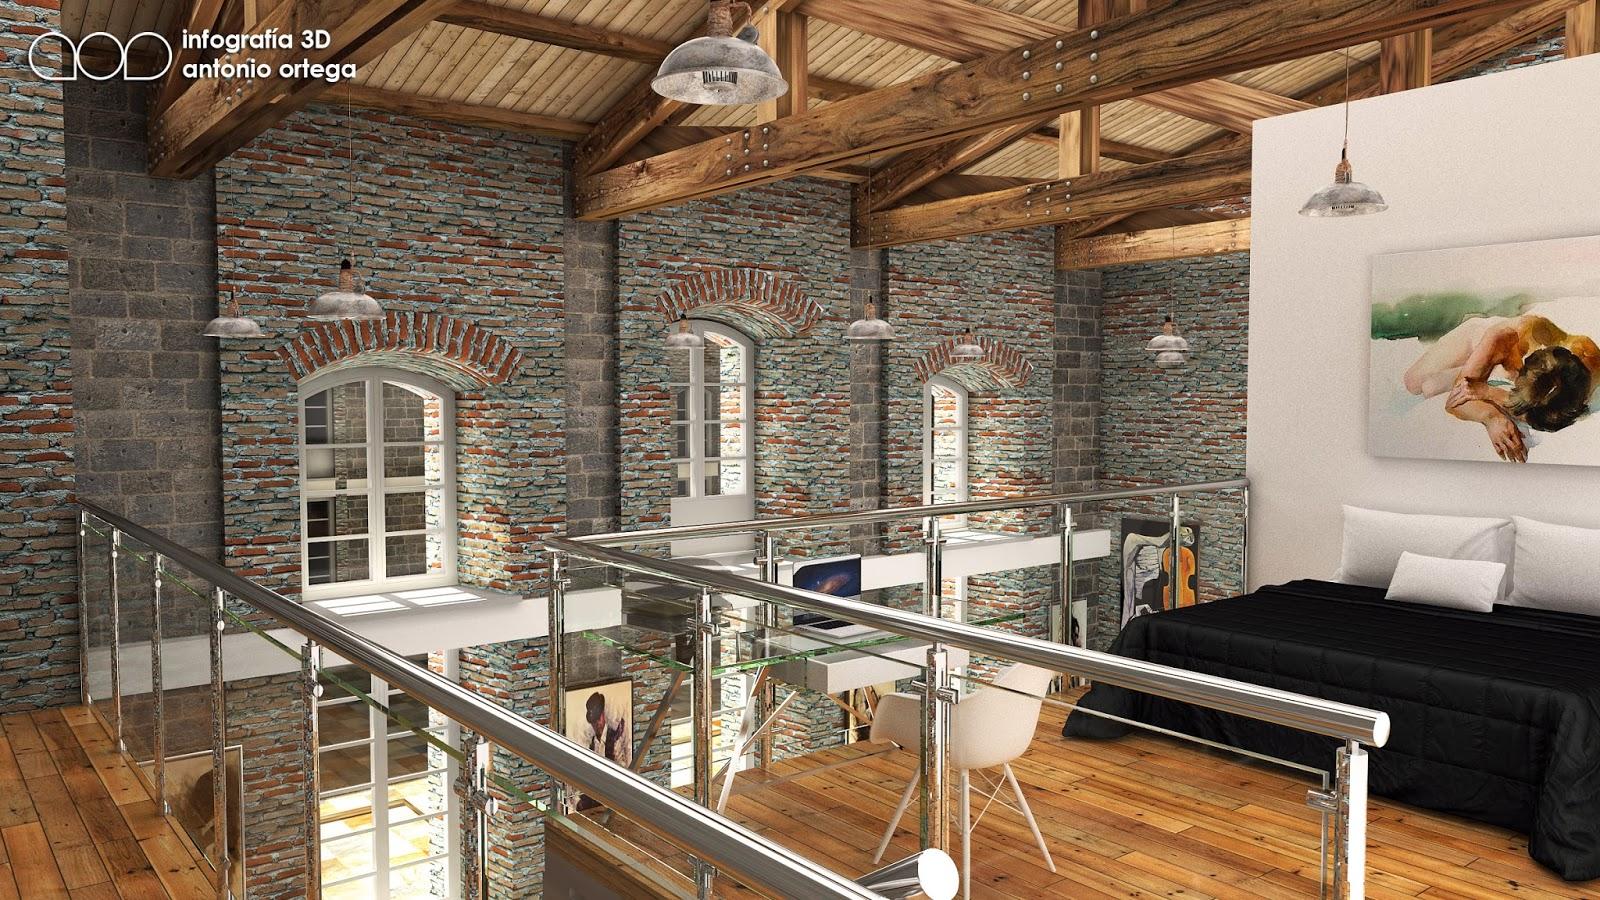 Antonio ortega industrial loft - Loft industrial ...